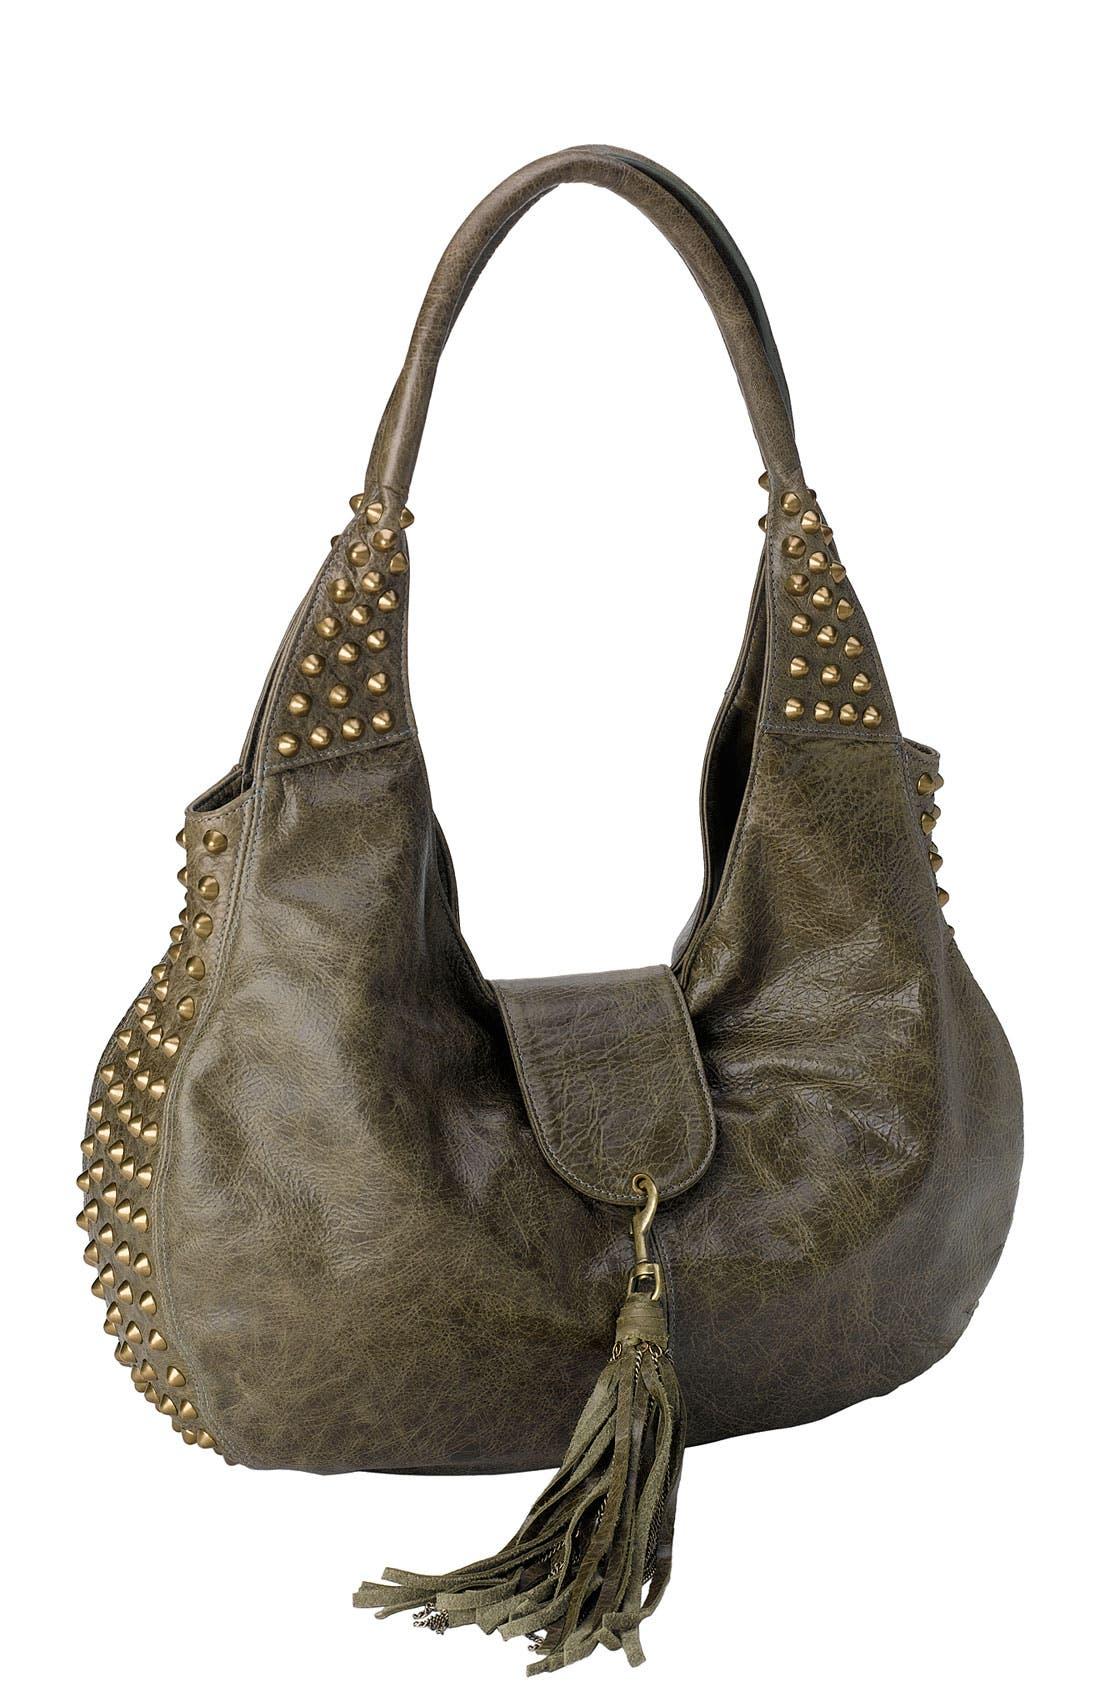 Alternate Image 1 Selected - Cassandra LA 'Naho' Tassel Flap Leather Hobo